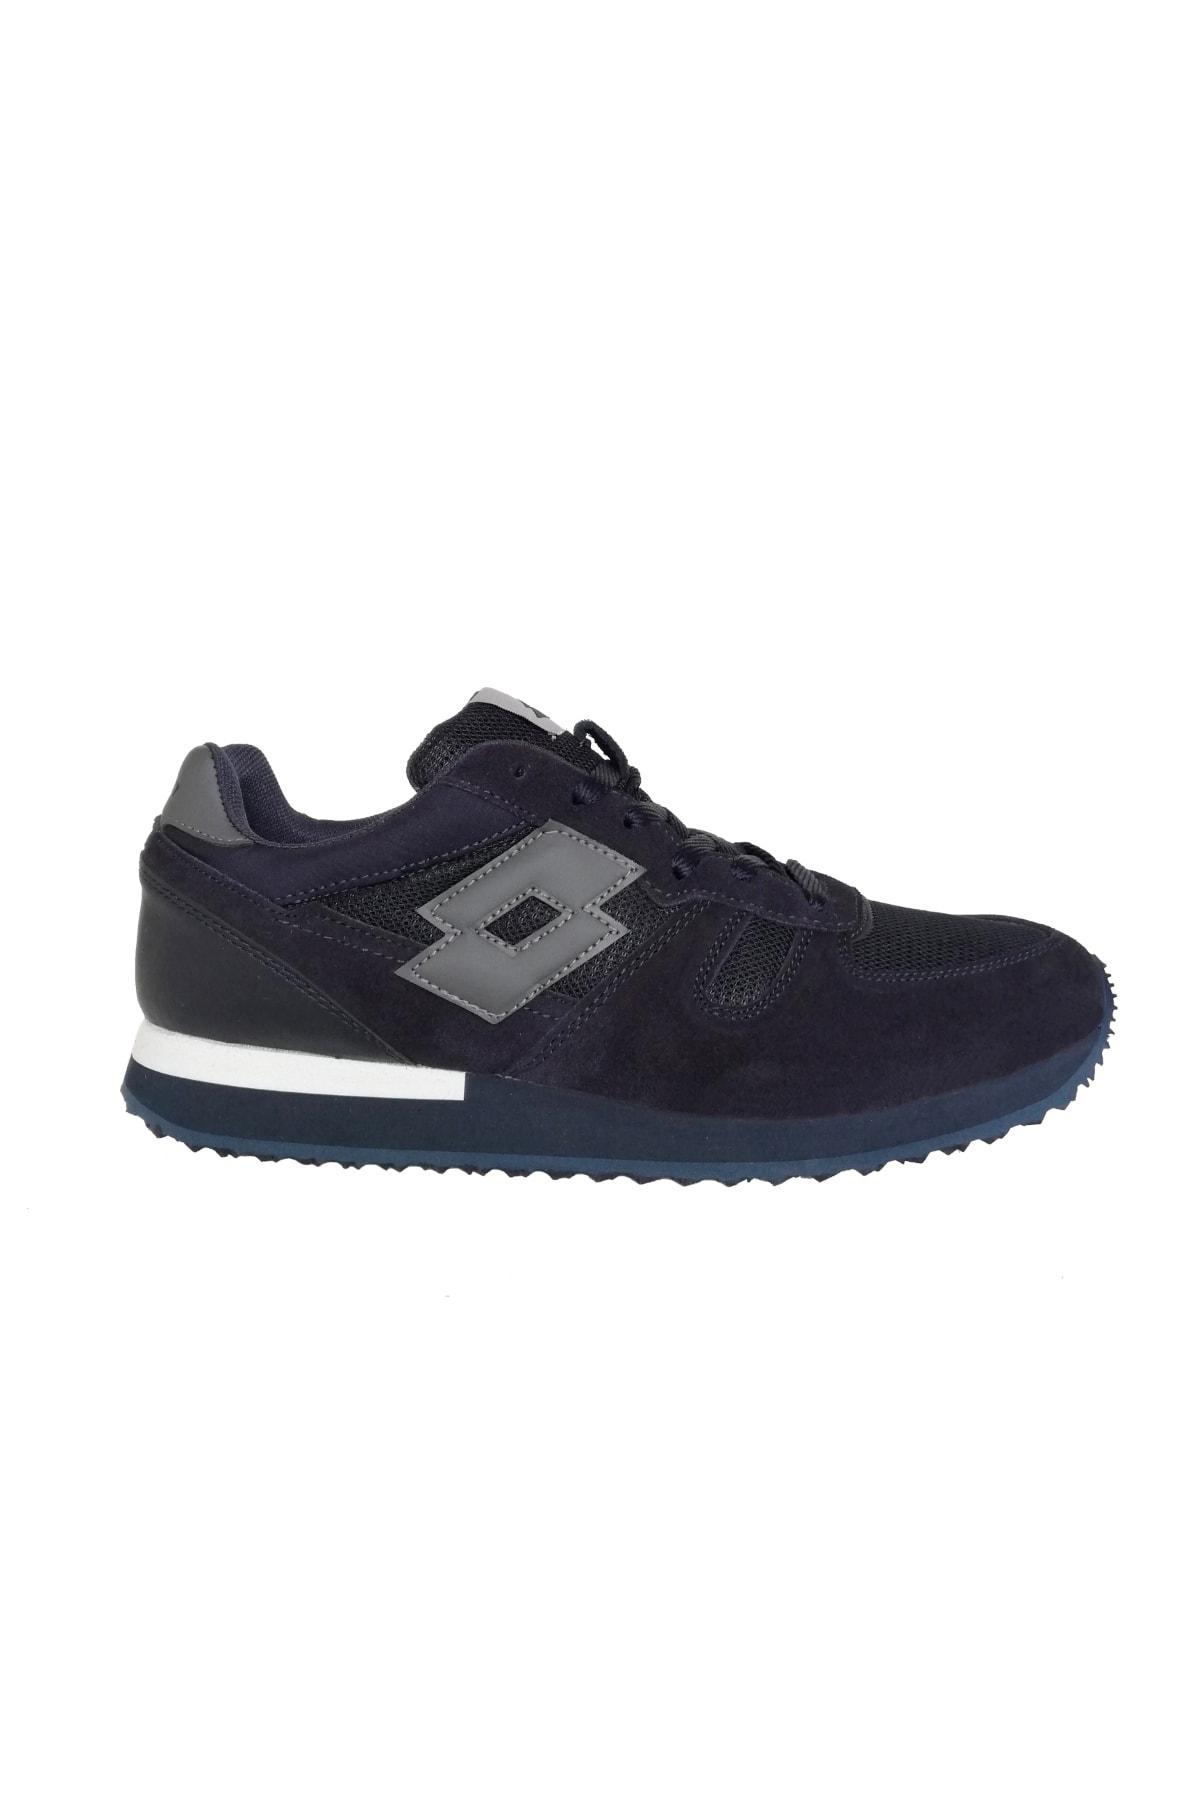 Lotto Sneaker Günlük Lacivert Erkek - T1410 2